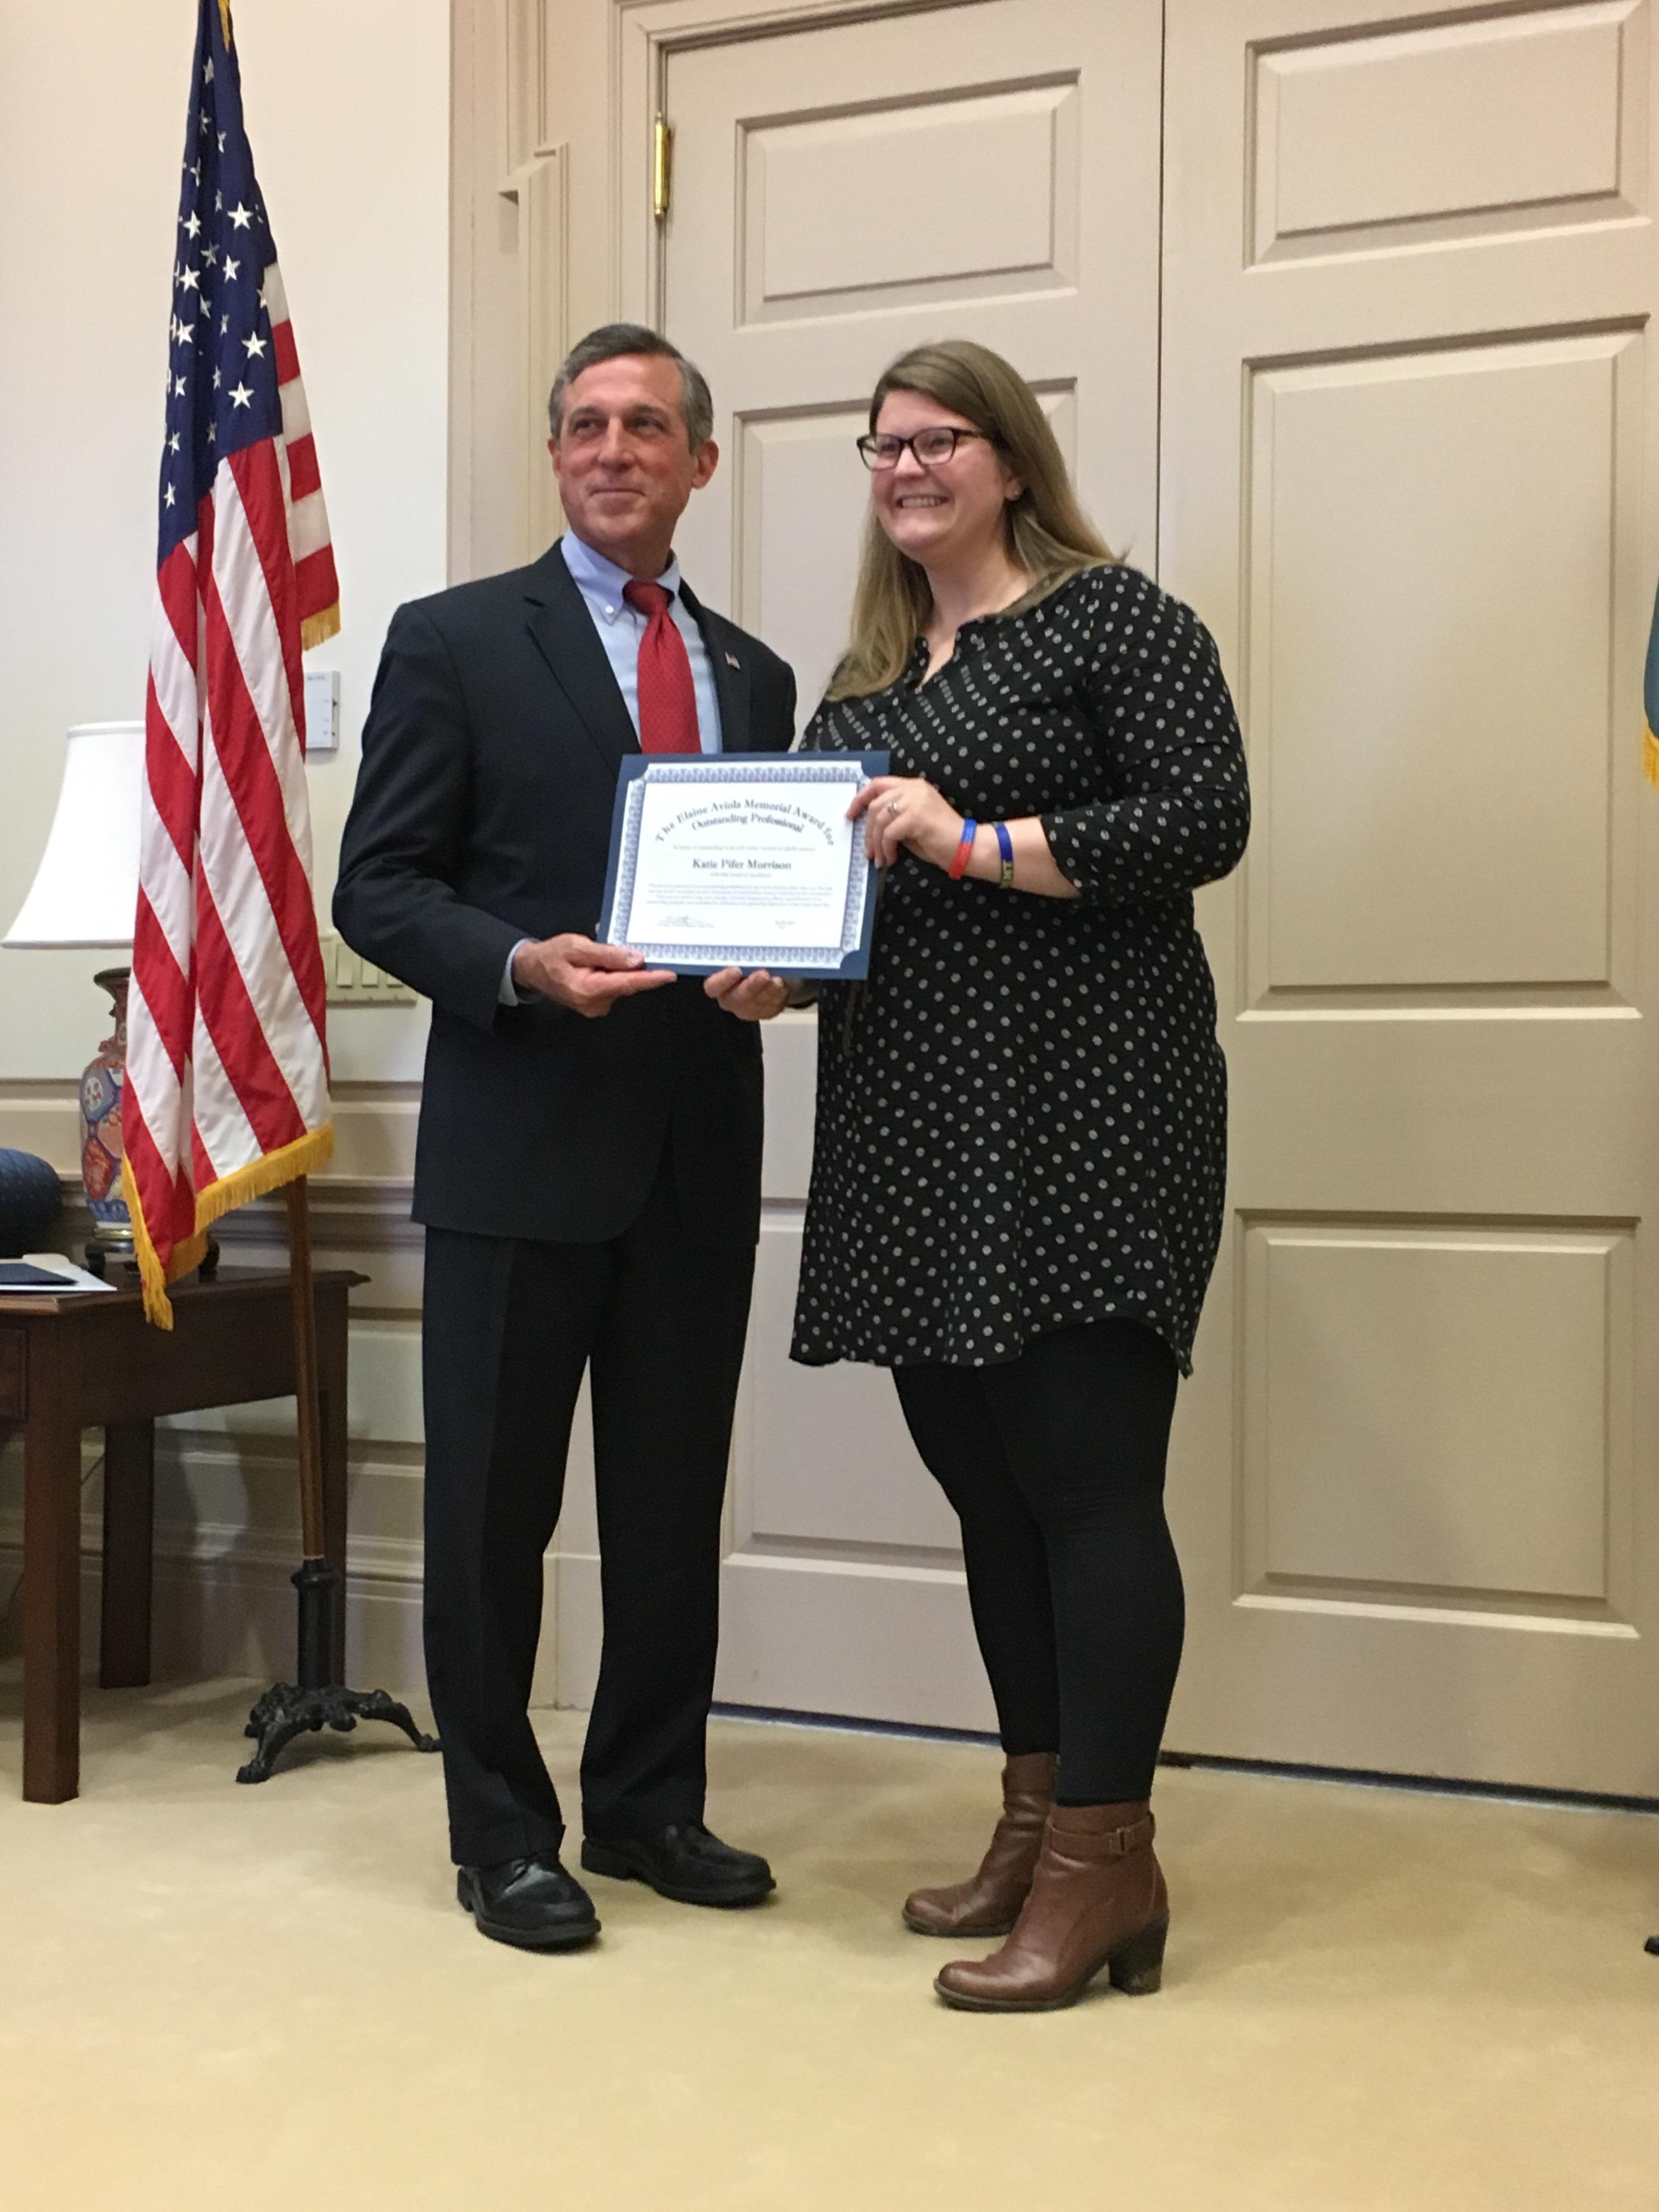 S.O.S. Advocate receives Award